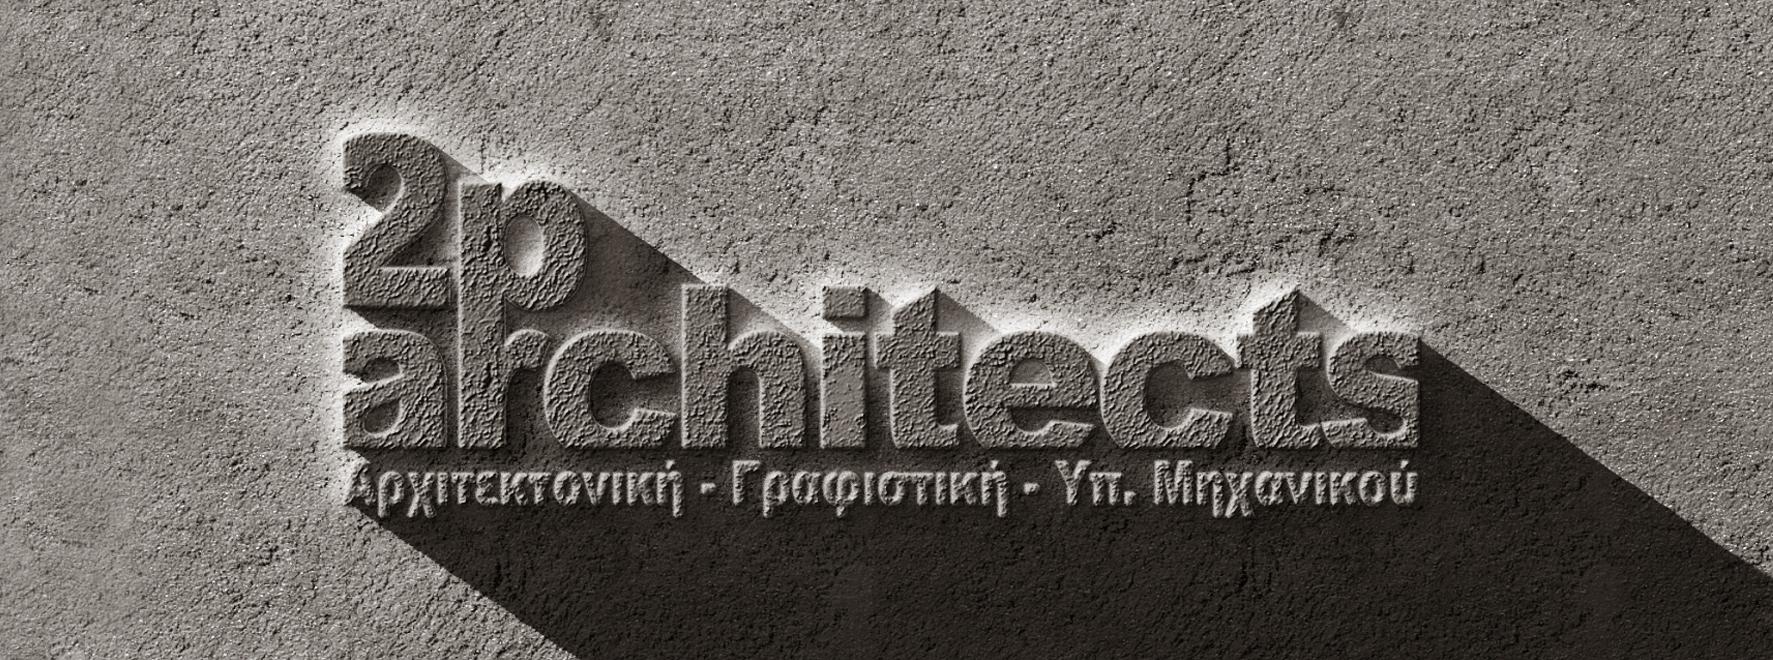 2p architects